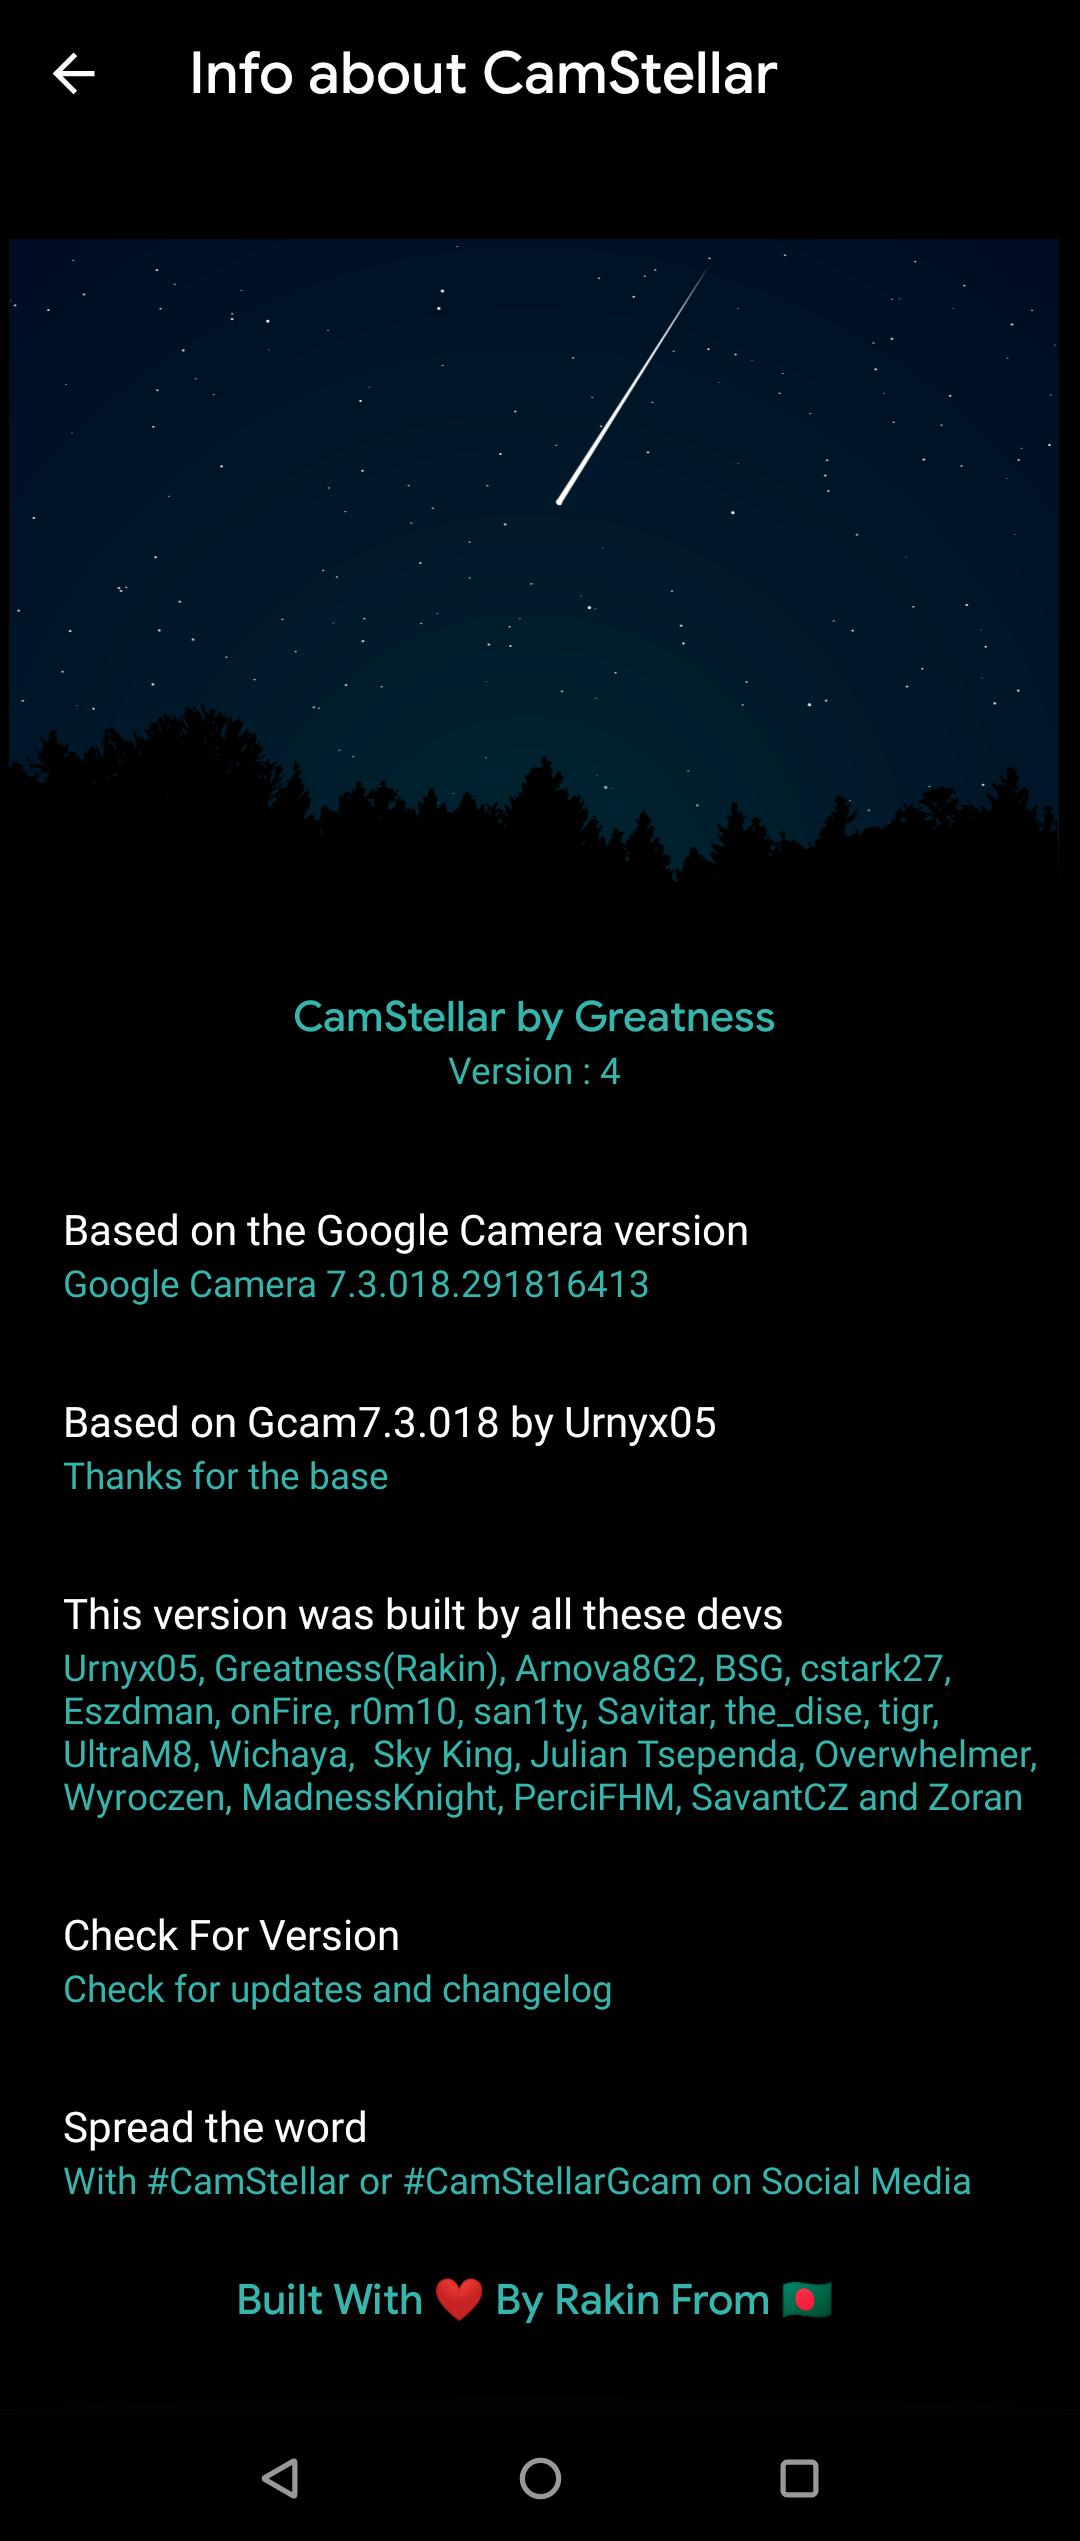 CamStellar v4 01